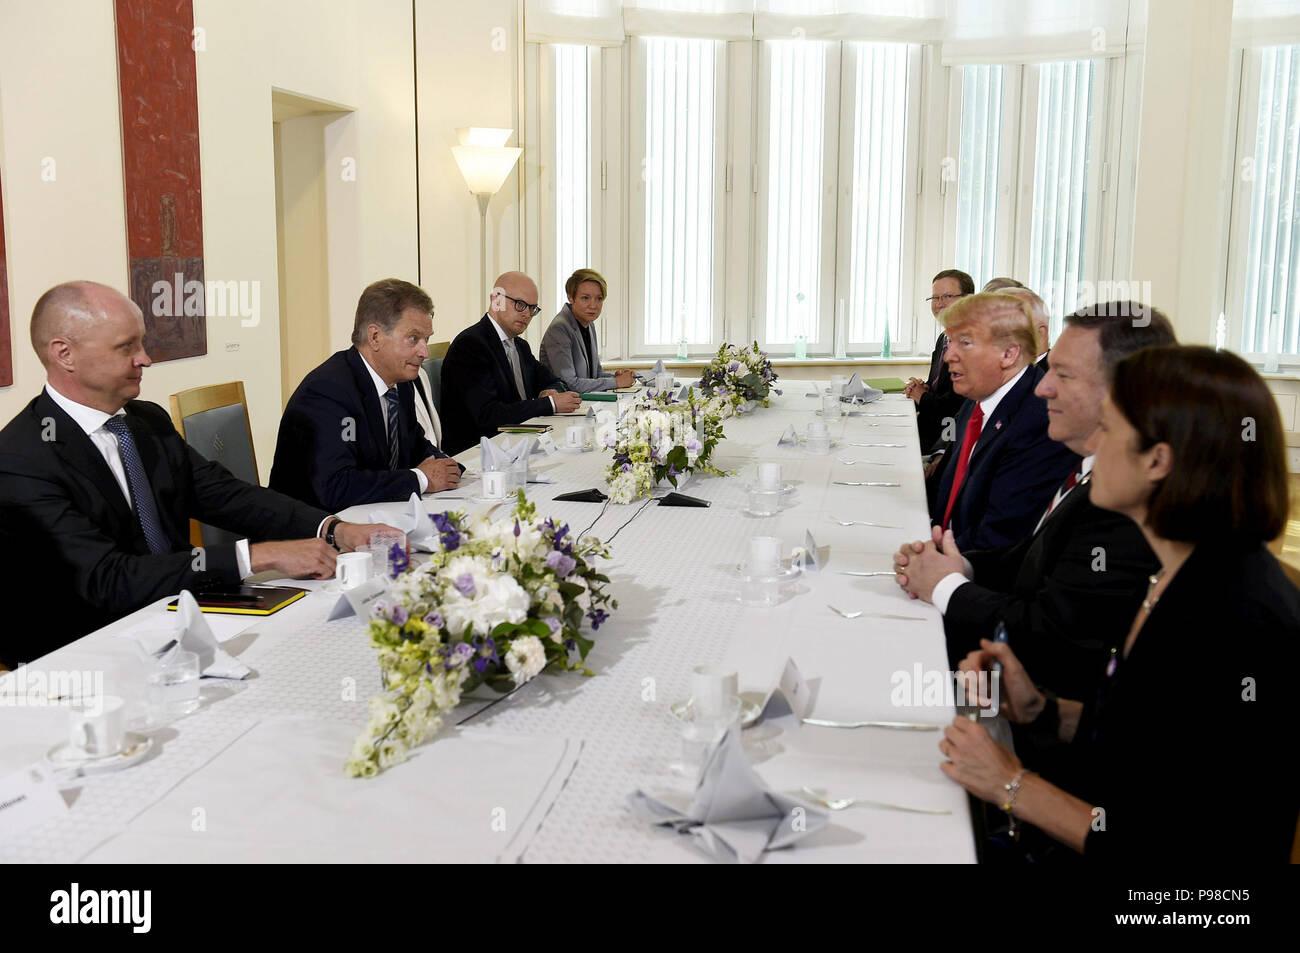 Helsinki, Finland. 16th July, 2018. U.S. President Donald Trump (3rd R) meets with Finnish President Sauli Niinisto (2nd L) in Helsinki, Finland, on July 16, 2018. Credit: Lehtikuva/Martti Kainulainen/Xinhua/Alamy Live News Stock Photo